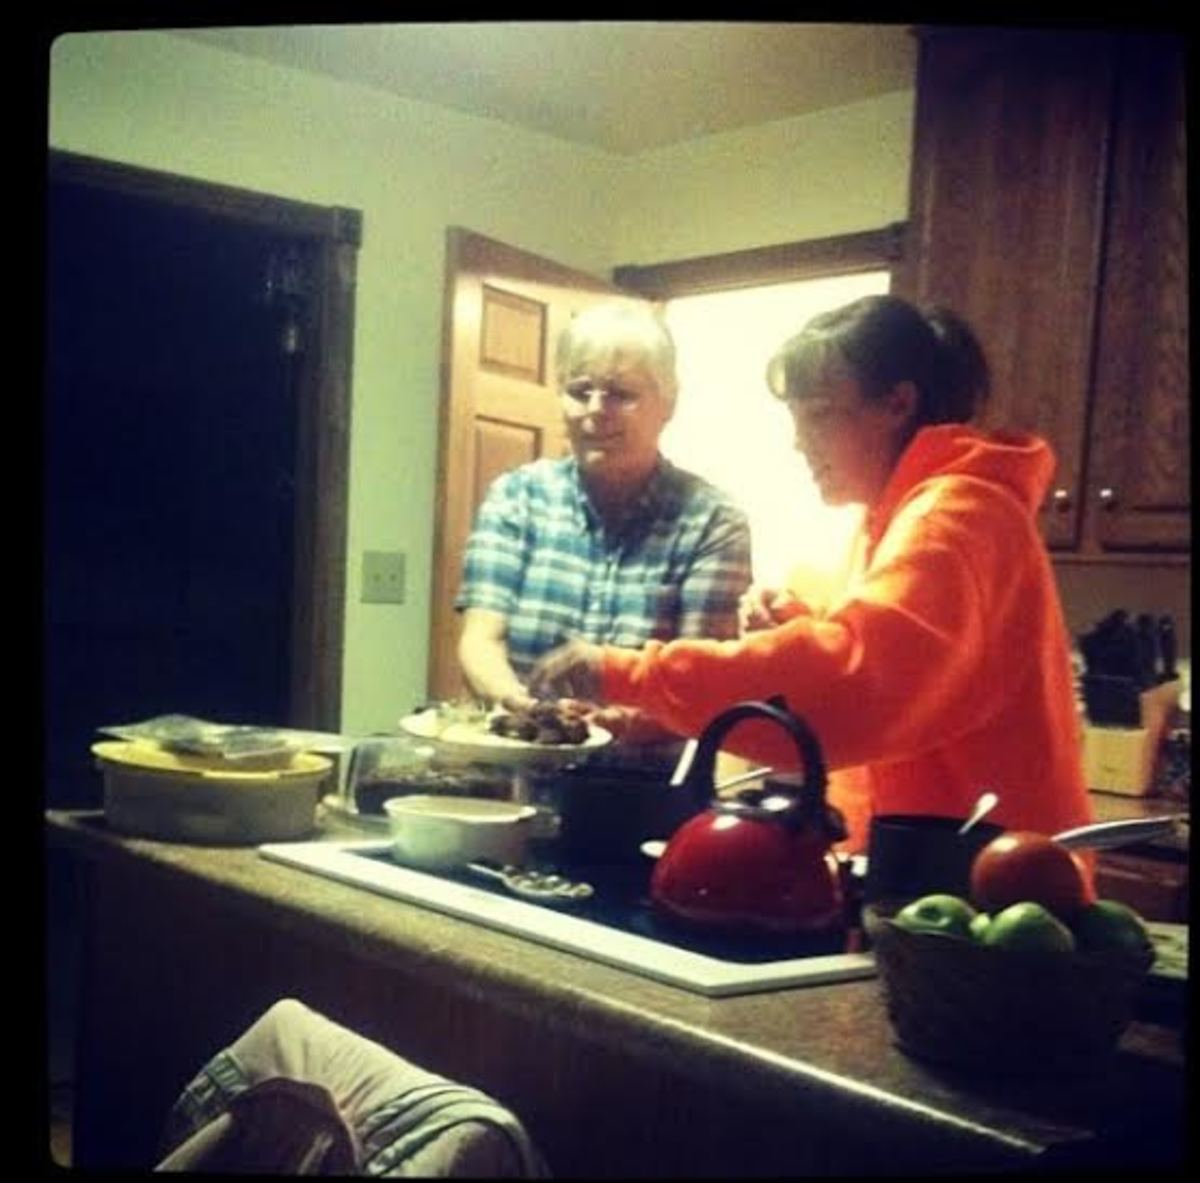 Sunday dinner at Mama's house.